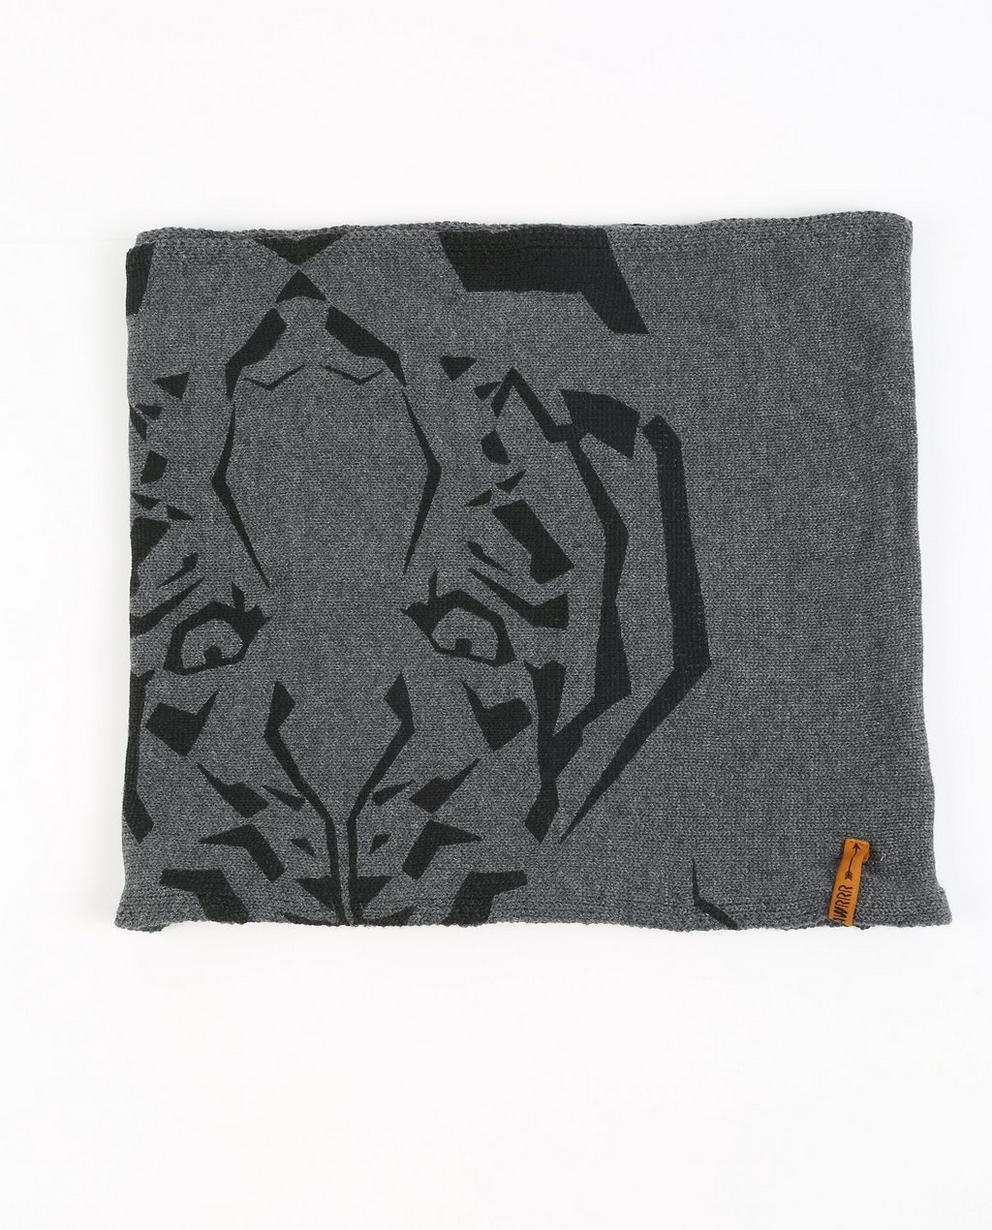 Schal mit Tigerprint - in Dunkelgrau - Ketnet